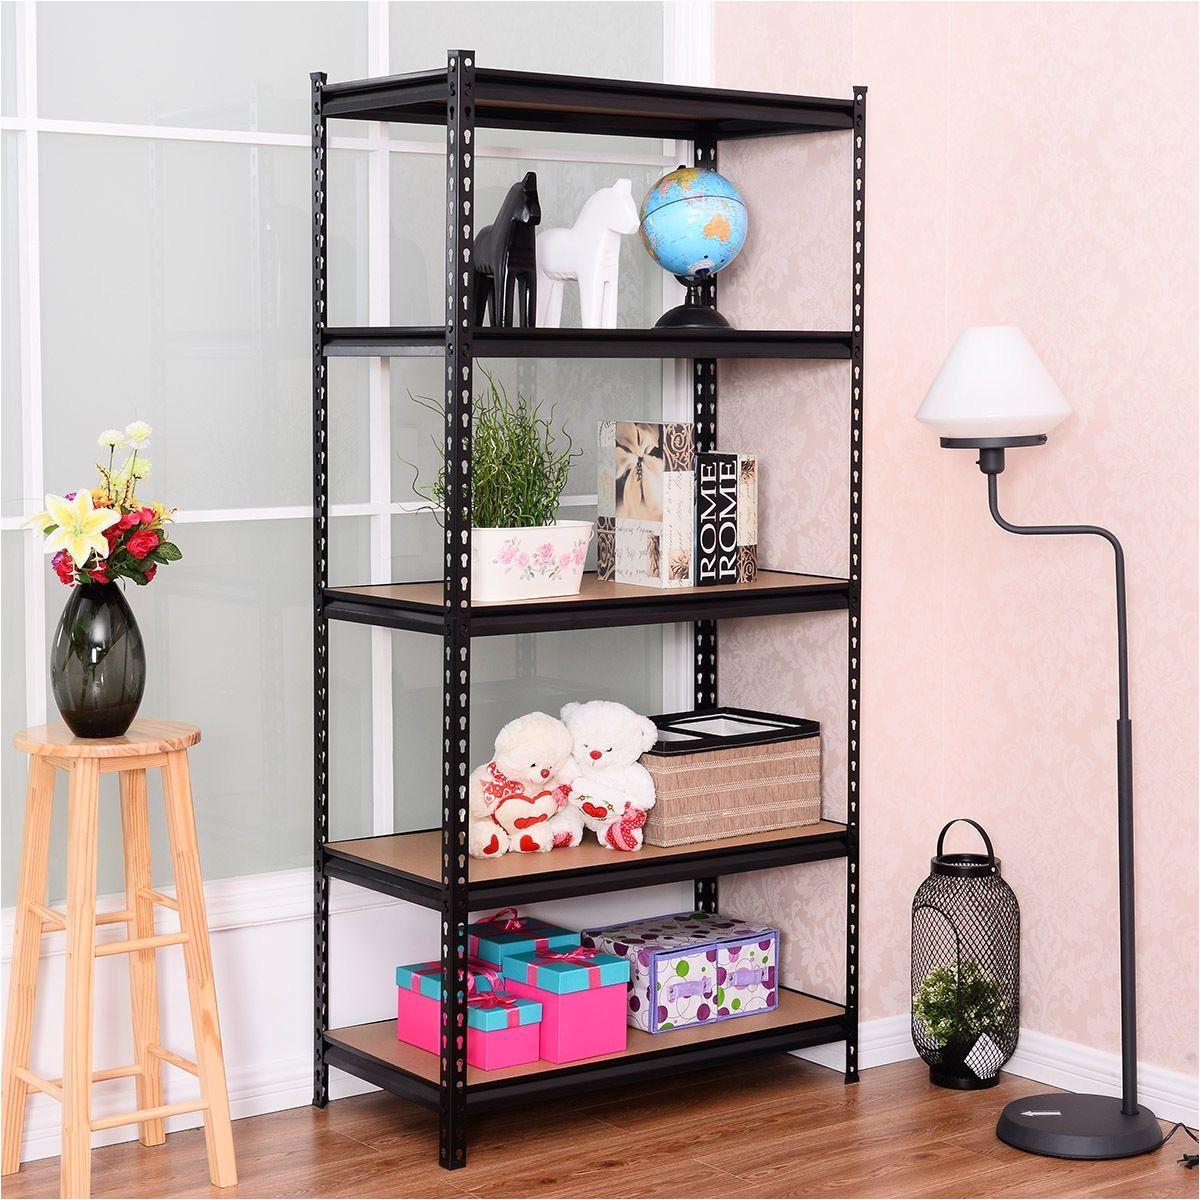 costway 72 5 level heavy duty shelf garage steel metal storage rack adjustable shelves black